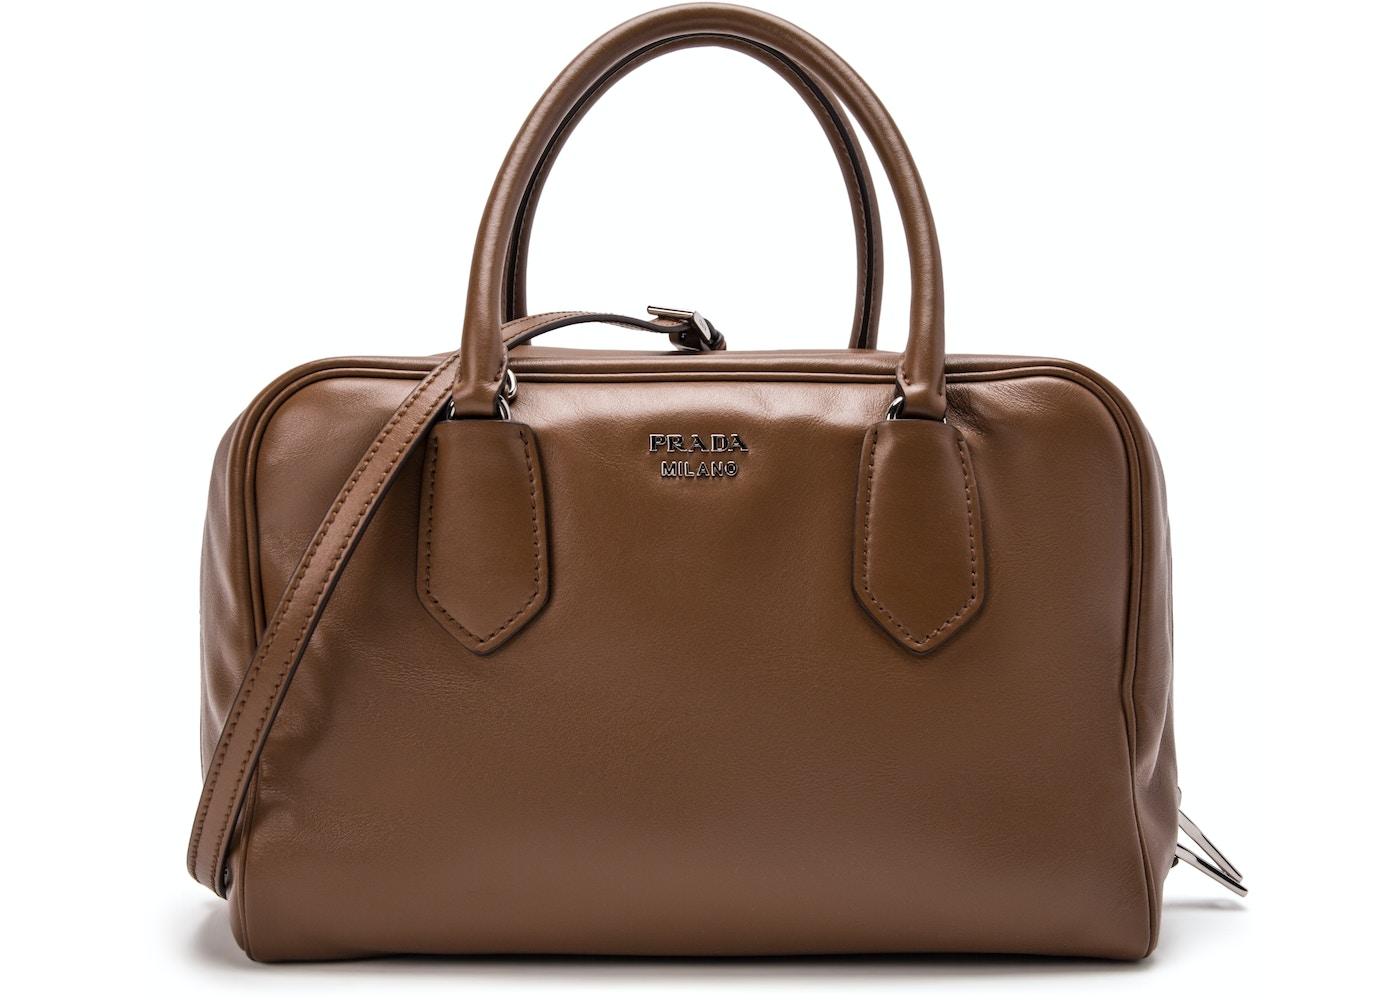 6dc3d5ffef1e68 Buy & Sell Prada Handbags - Price Premium